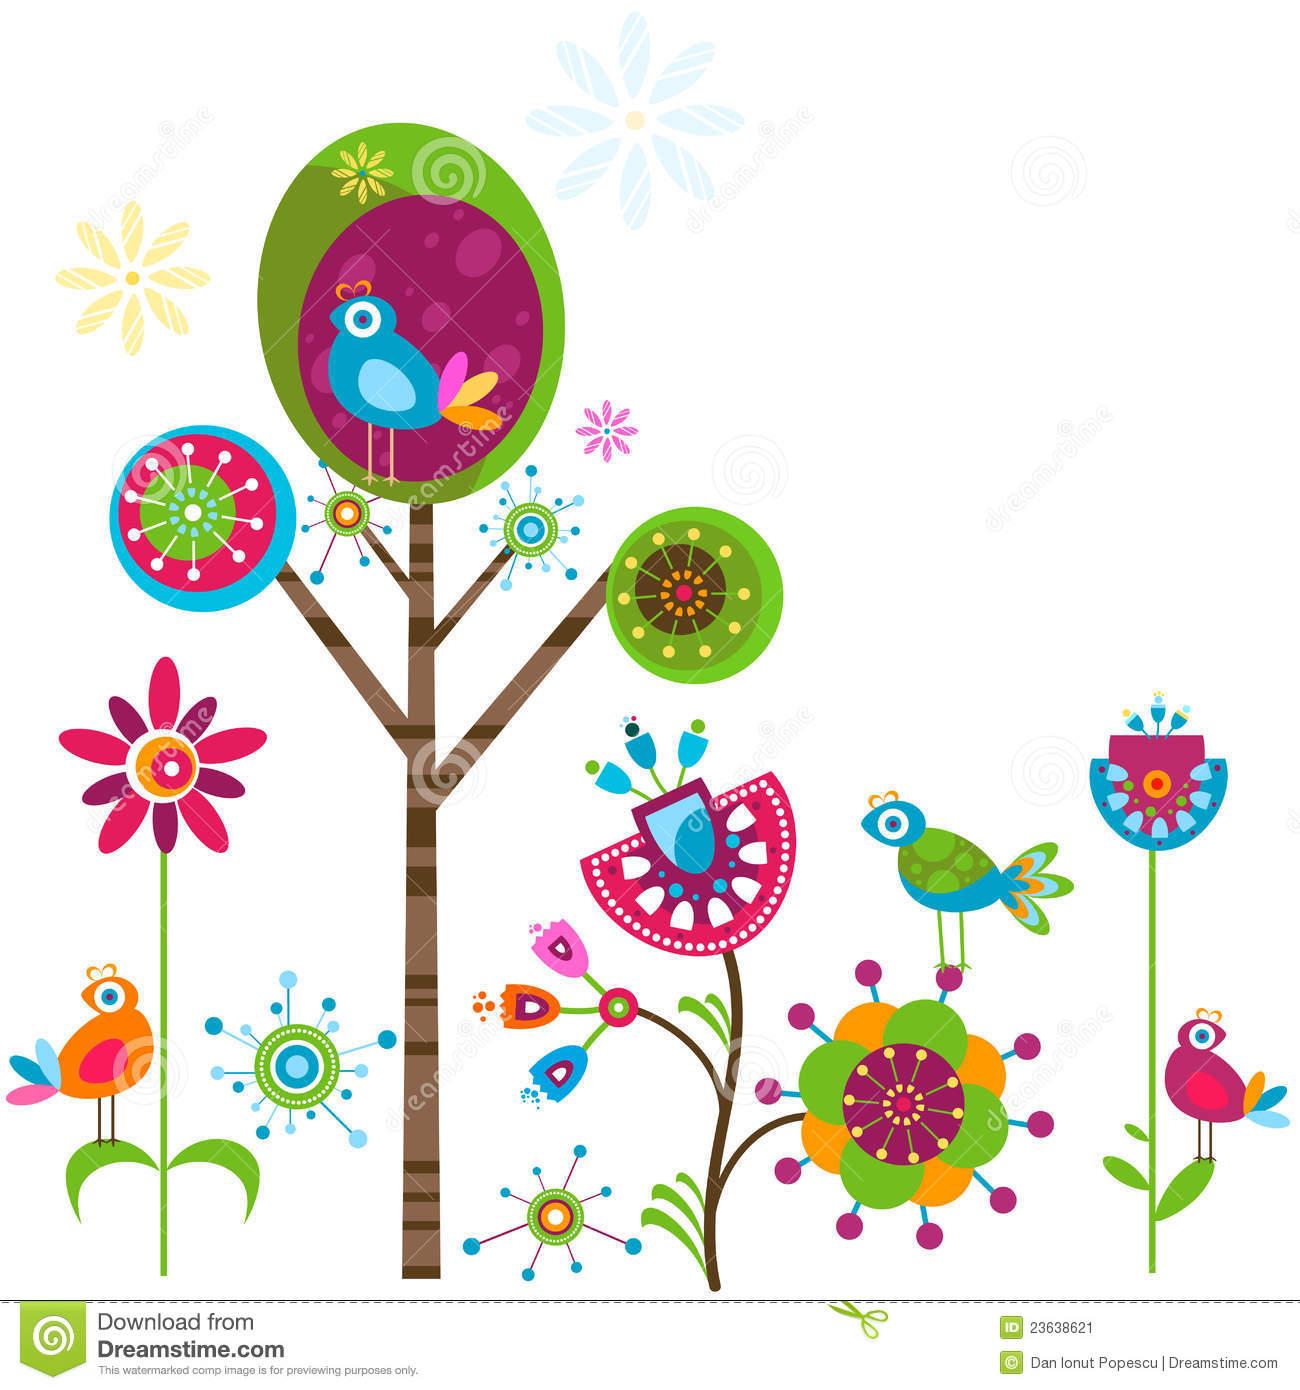 Whimsical flowers clip art clip art transparent stock Whimsy Flowers Stock Image - Image: 23638621 clip art transparent stock